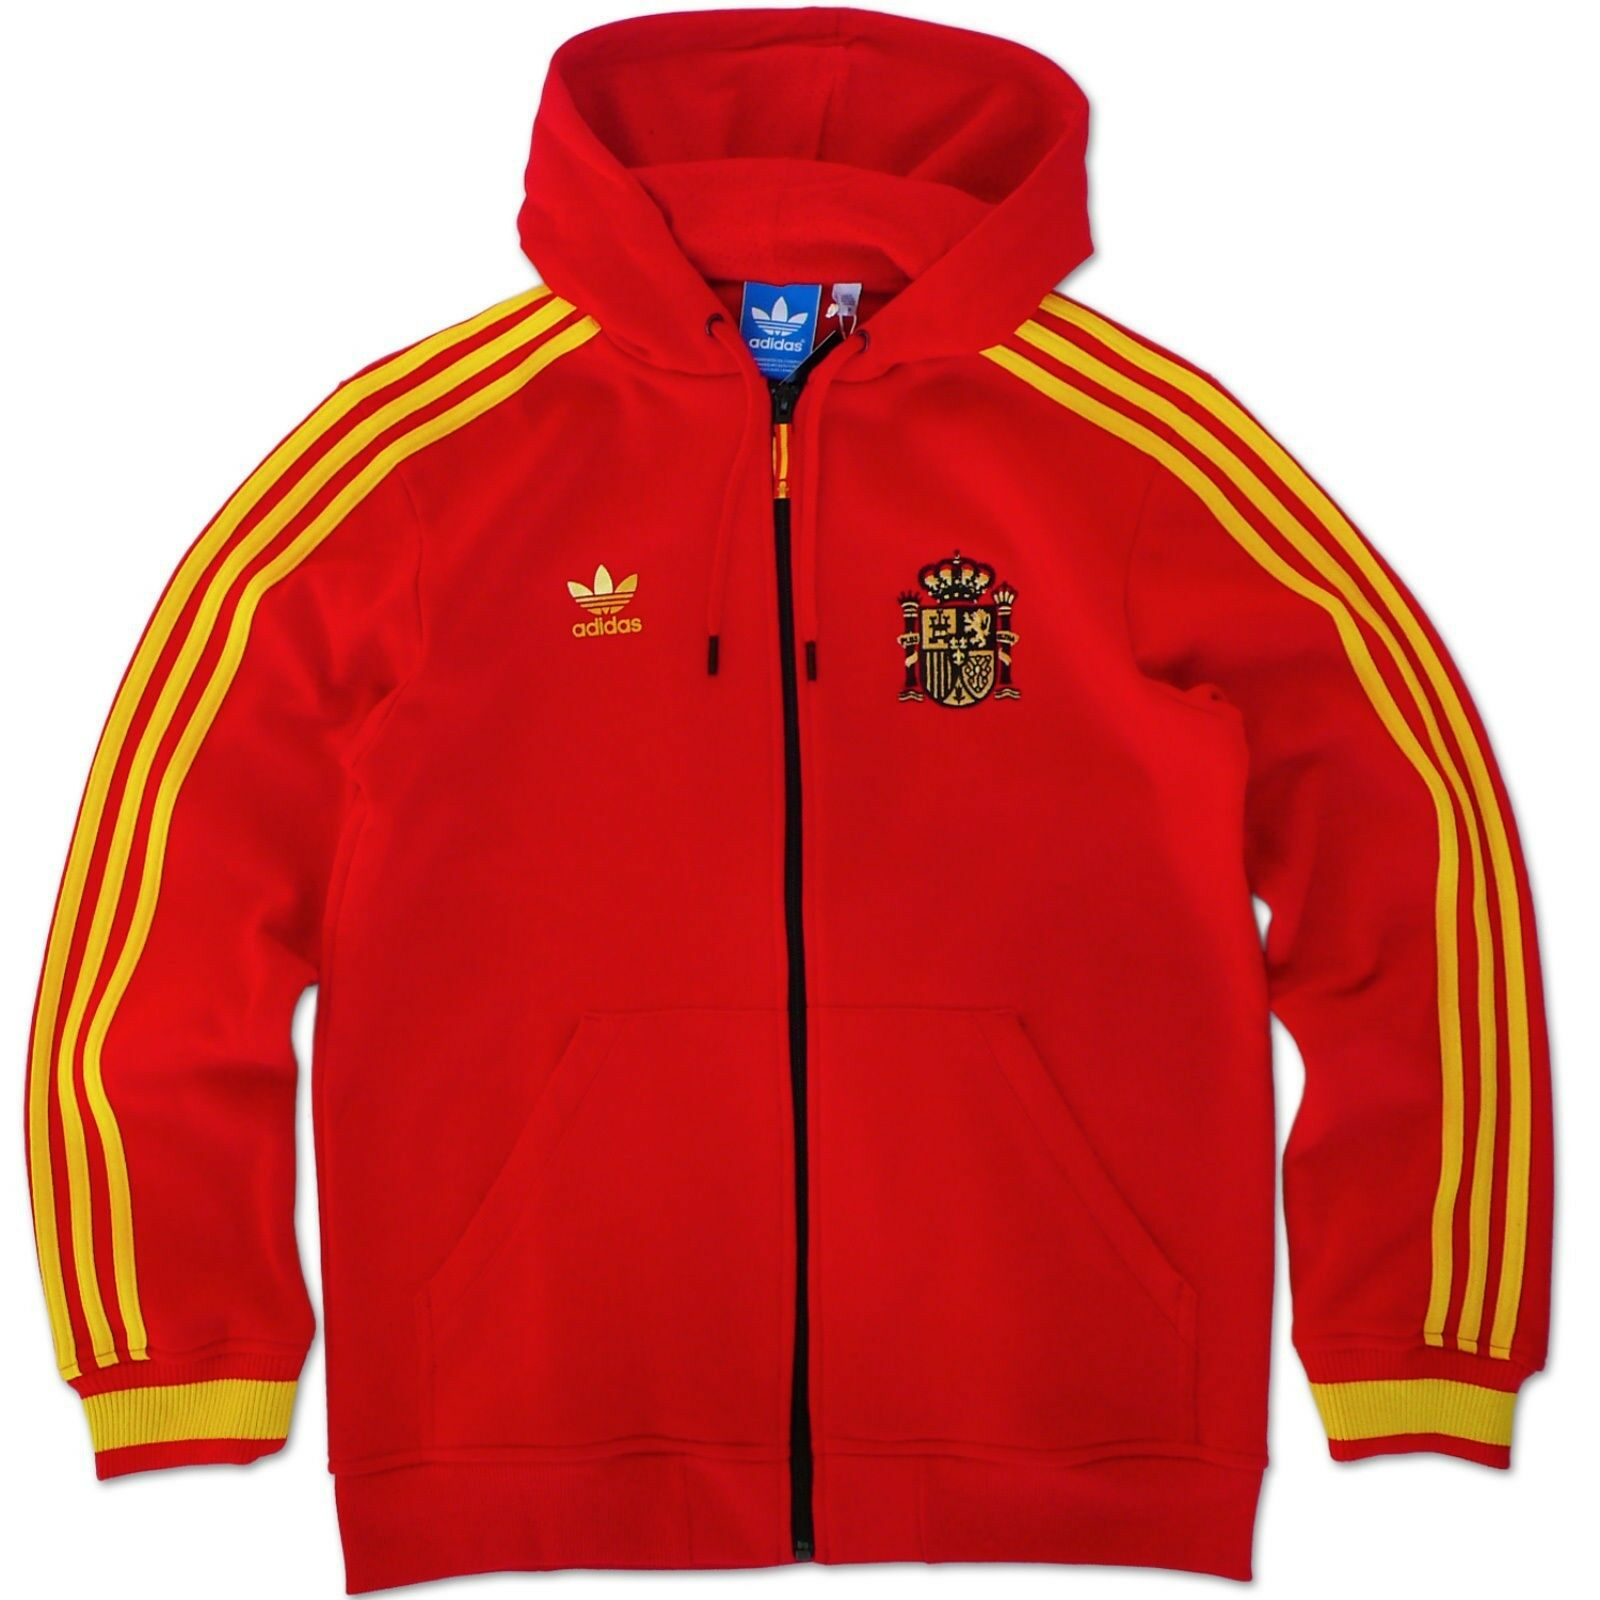 adidas Originals Spanien Jacke Rot